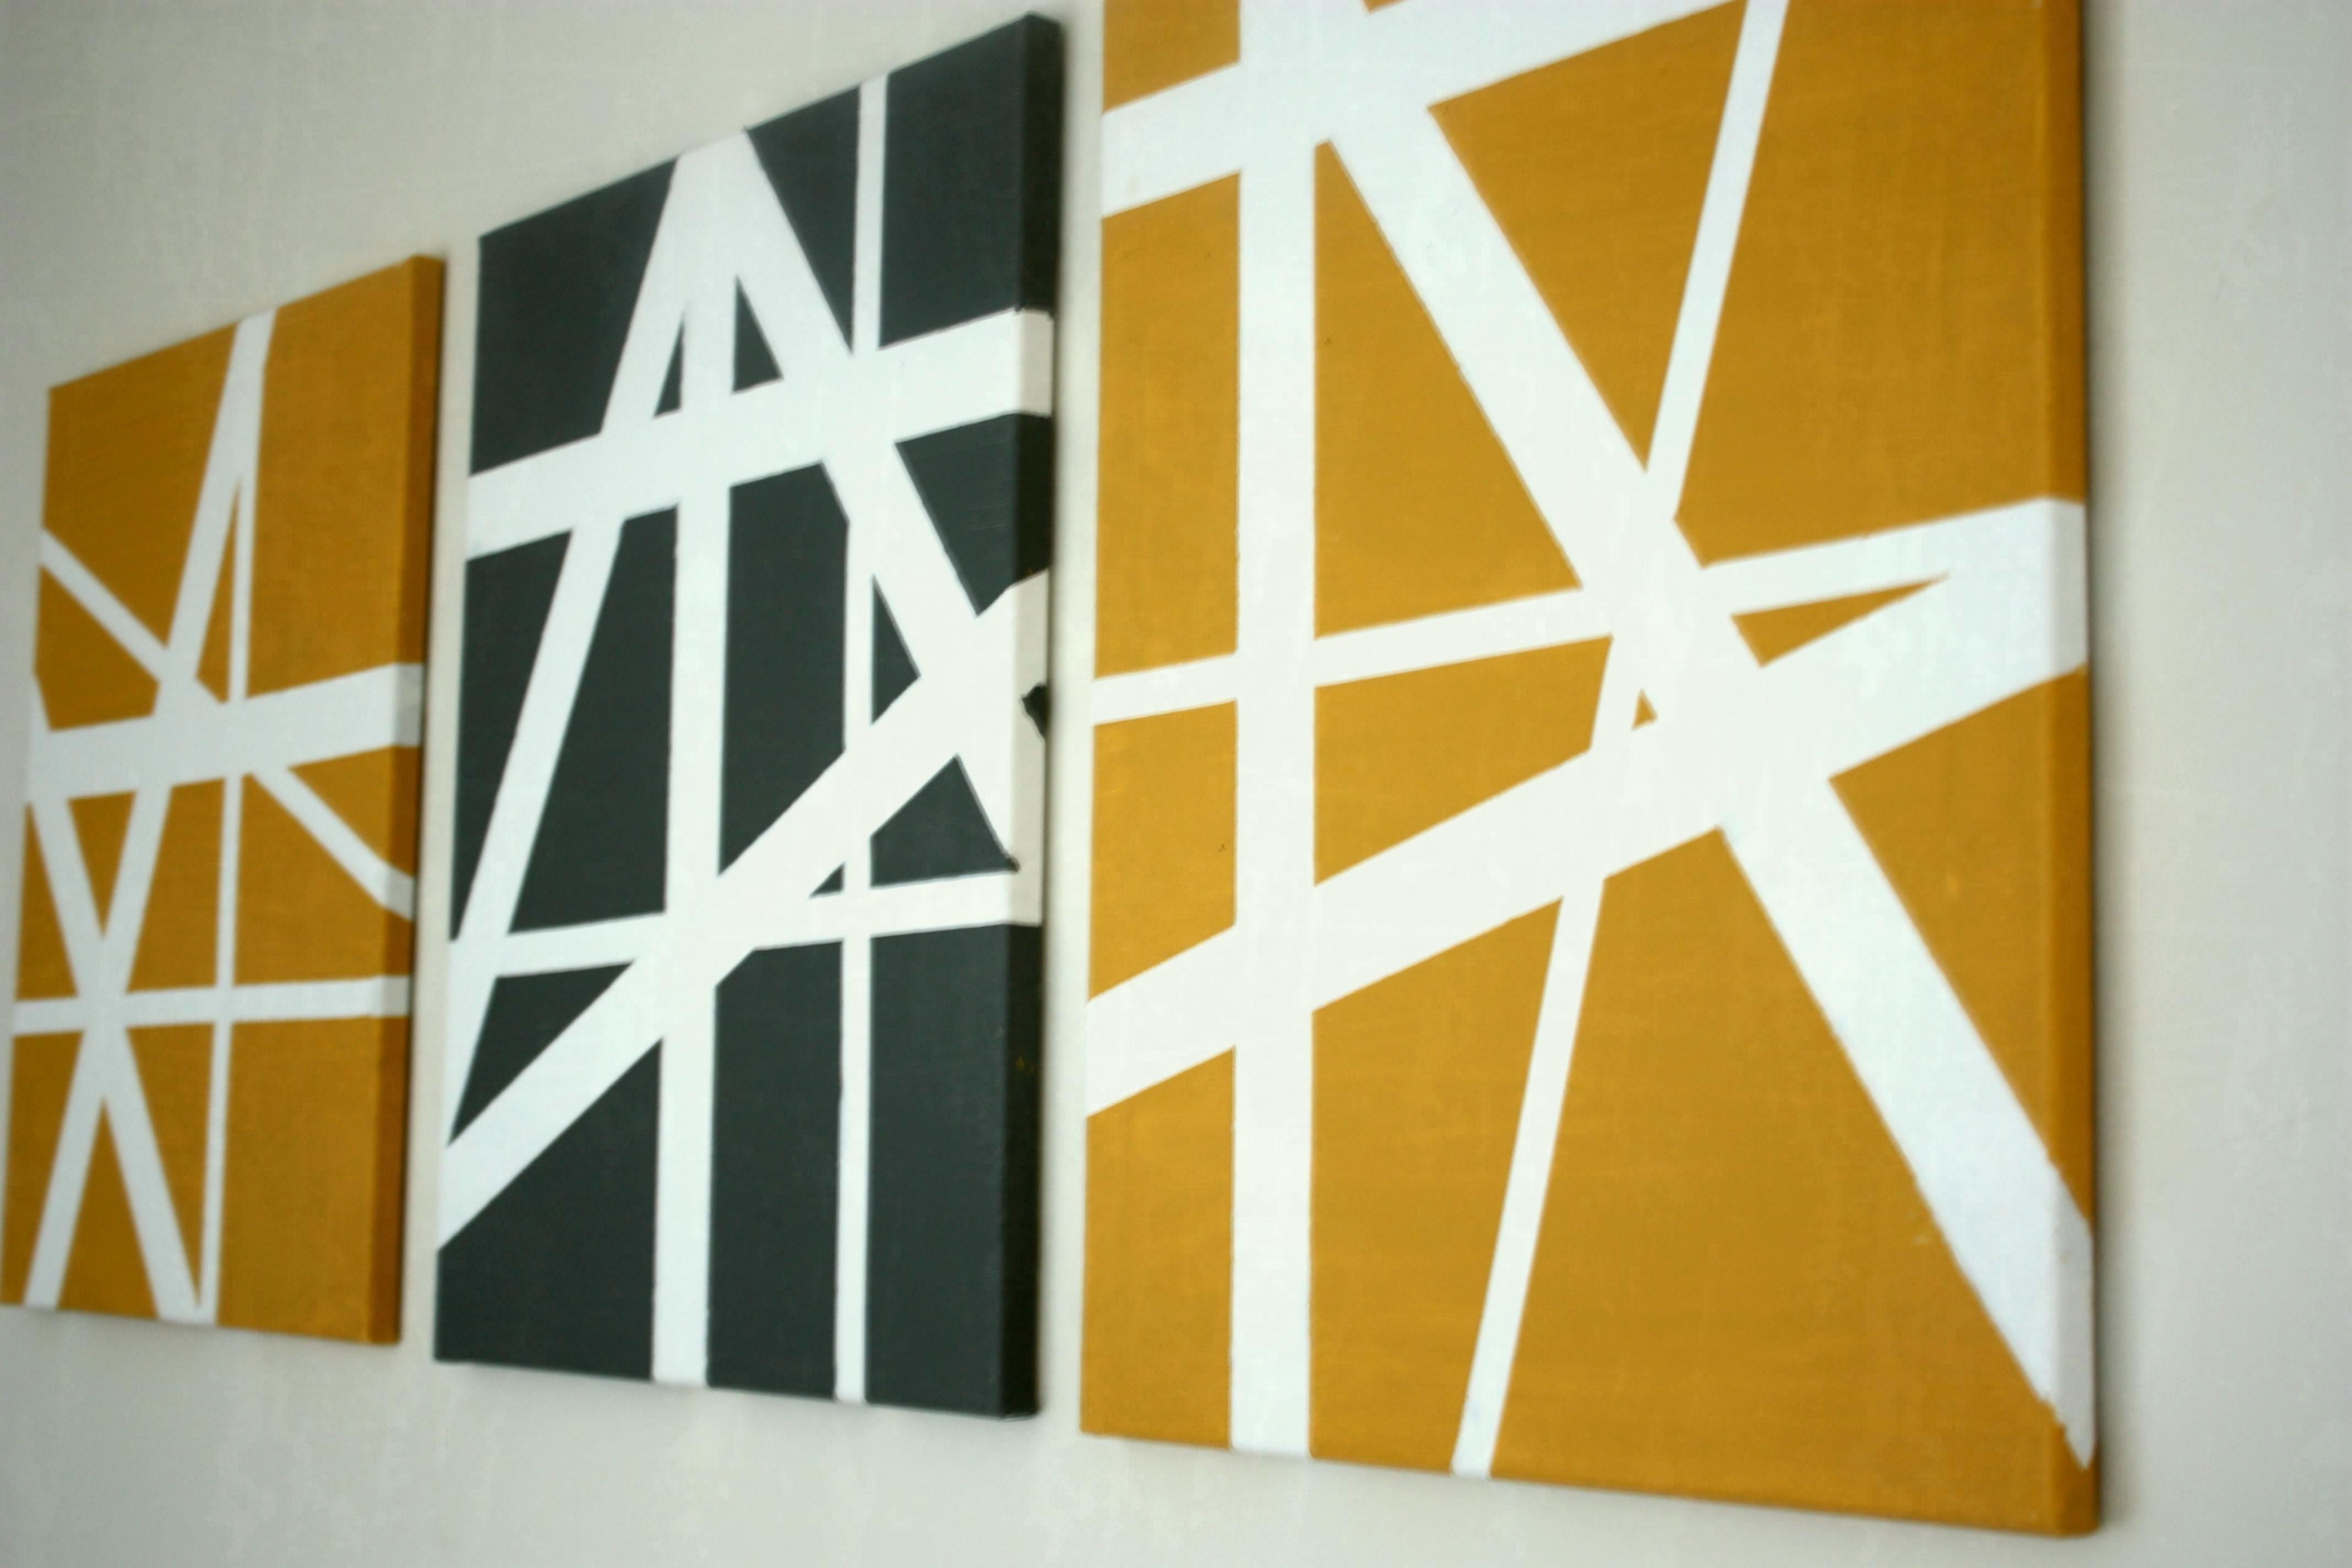 Living Room : Creative Decor Diy Canvas Wall Art Ideas Viewsize Throughout Favorite Wall Art Diy (View 13 of 15)